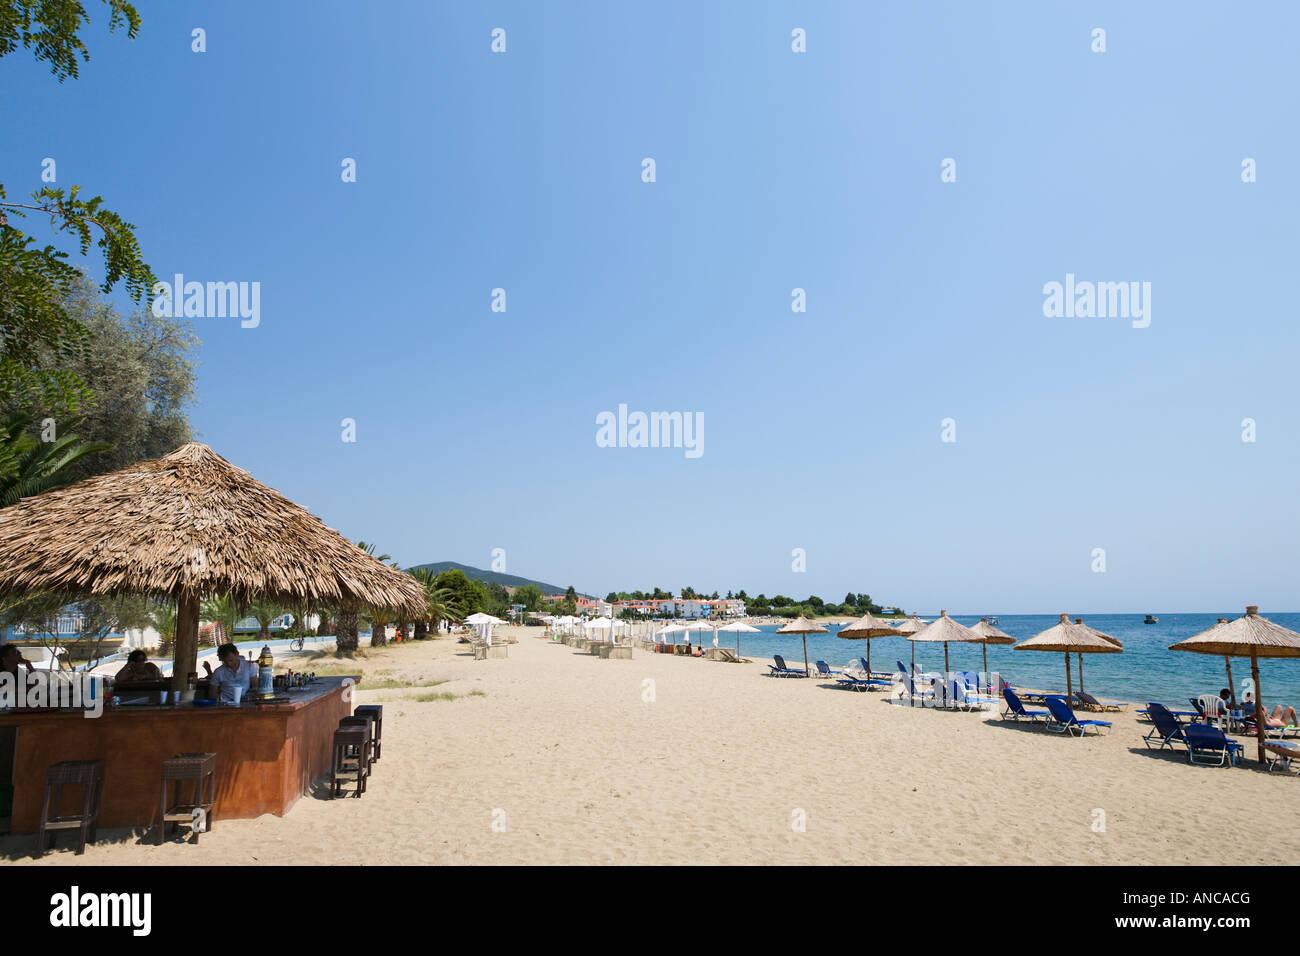 Beach and Beach Bar, Gerakina, Halkidiki, Greece - Stock Image